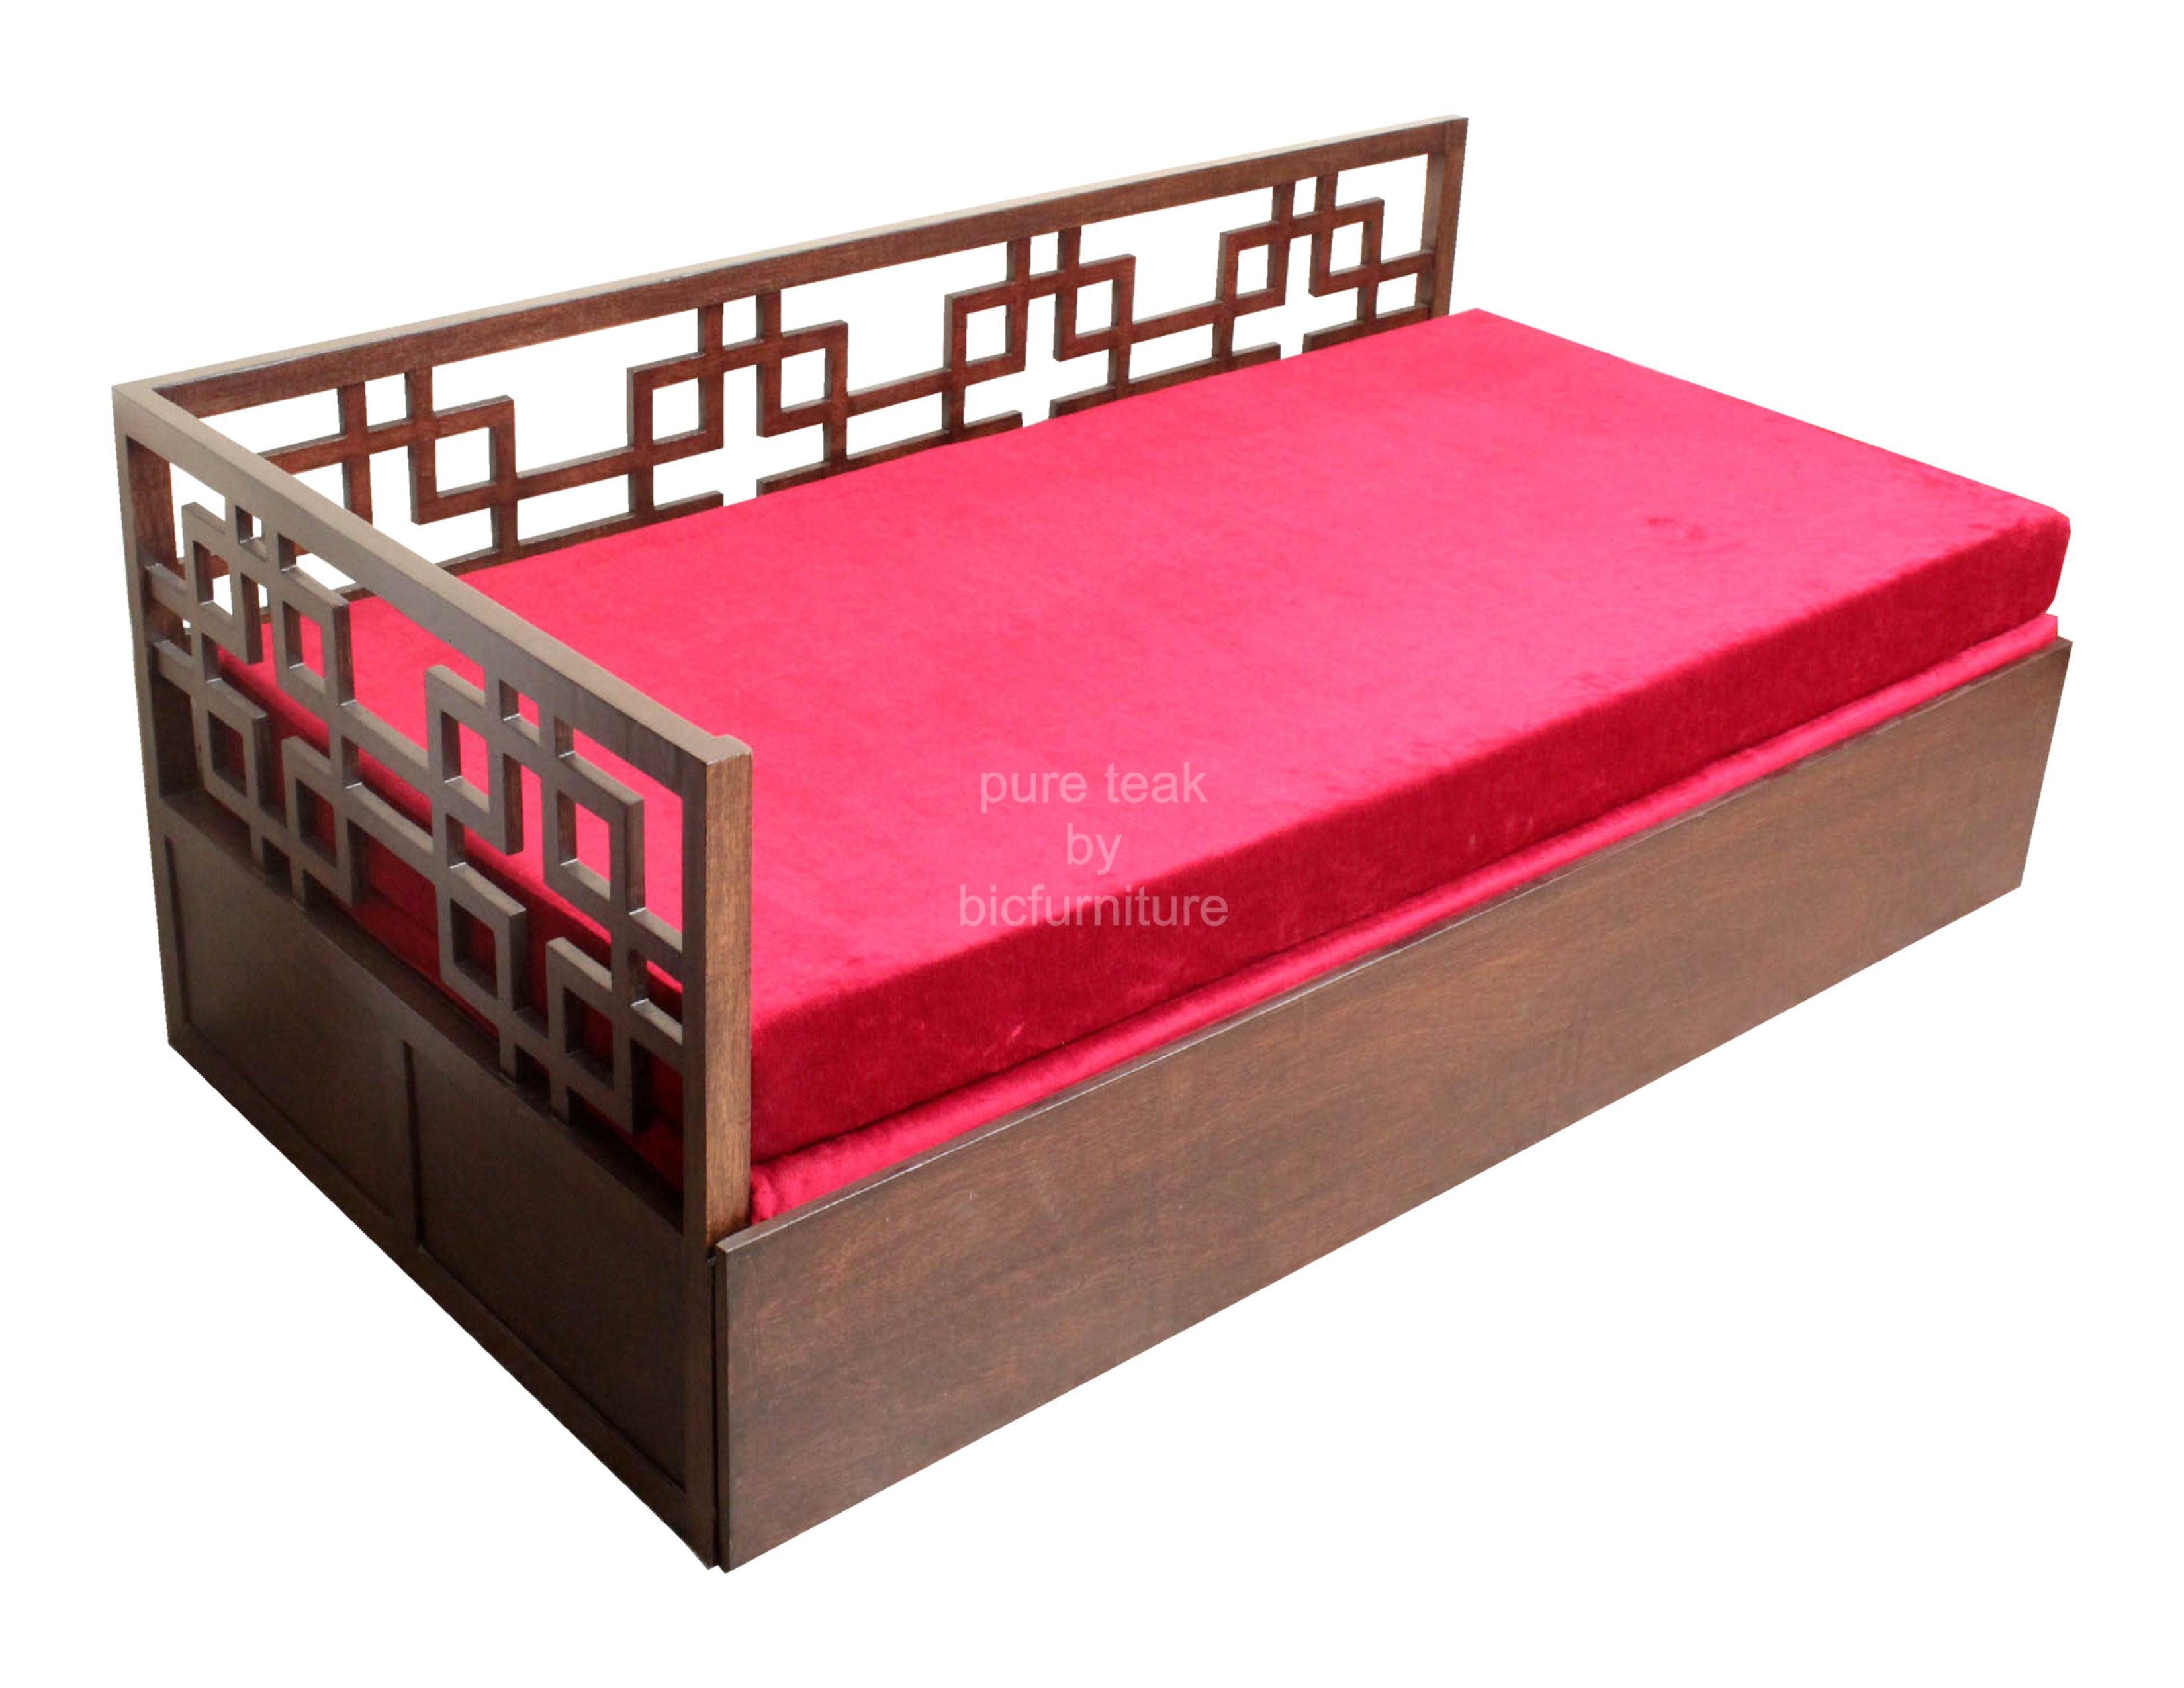 Jigsaw sofa cum bed in stylish design with storage